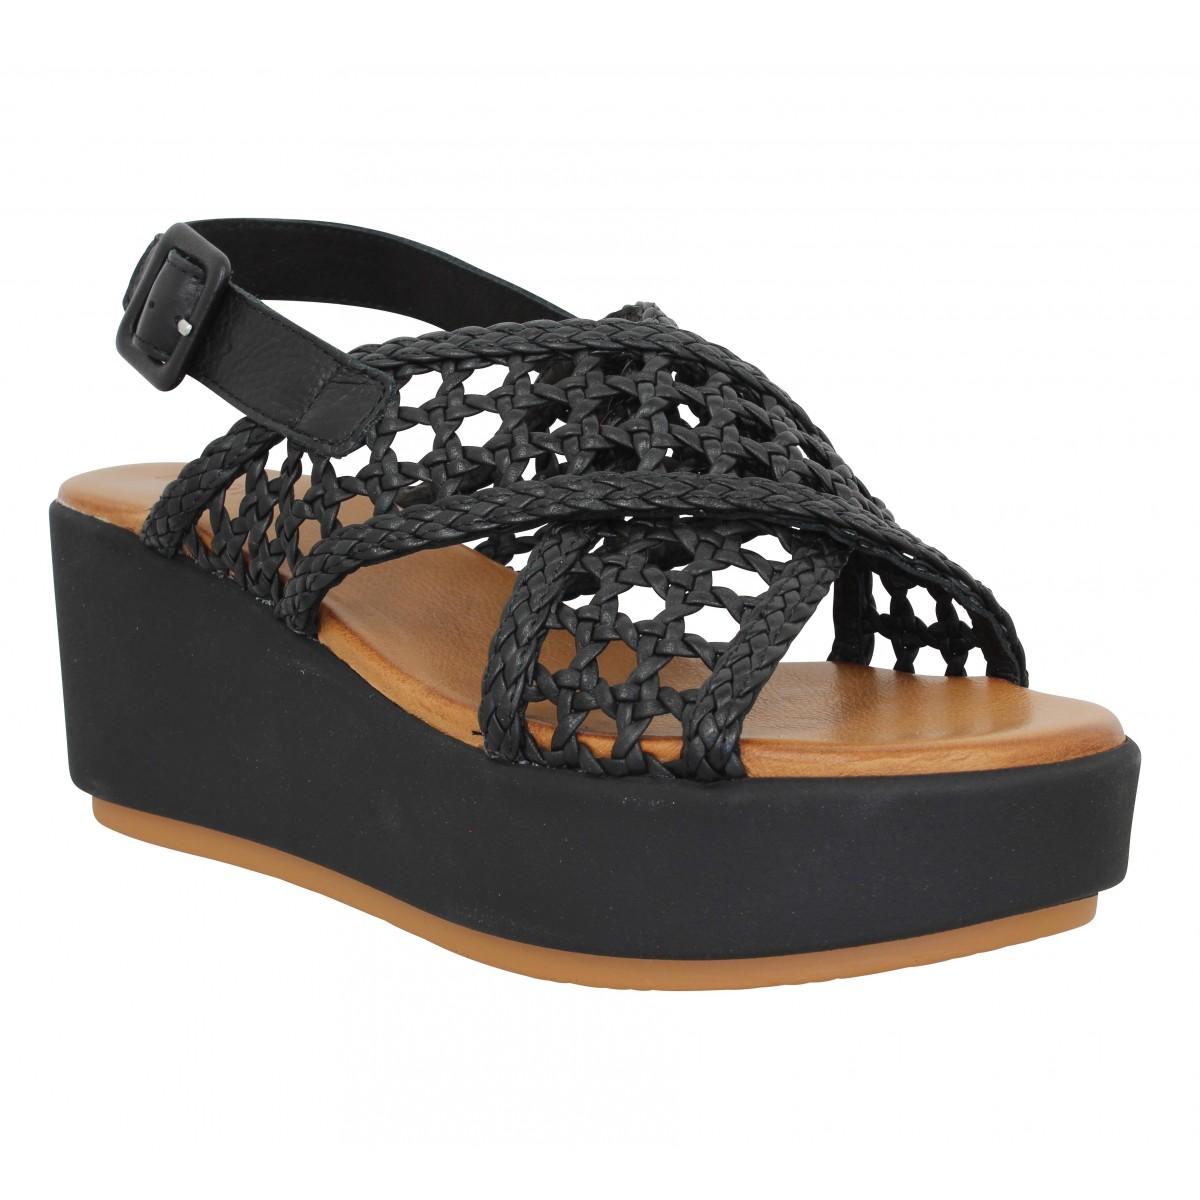 Sandales talons INUOVO 123064 cuir tresse Femme Noir